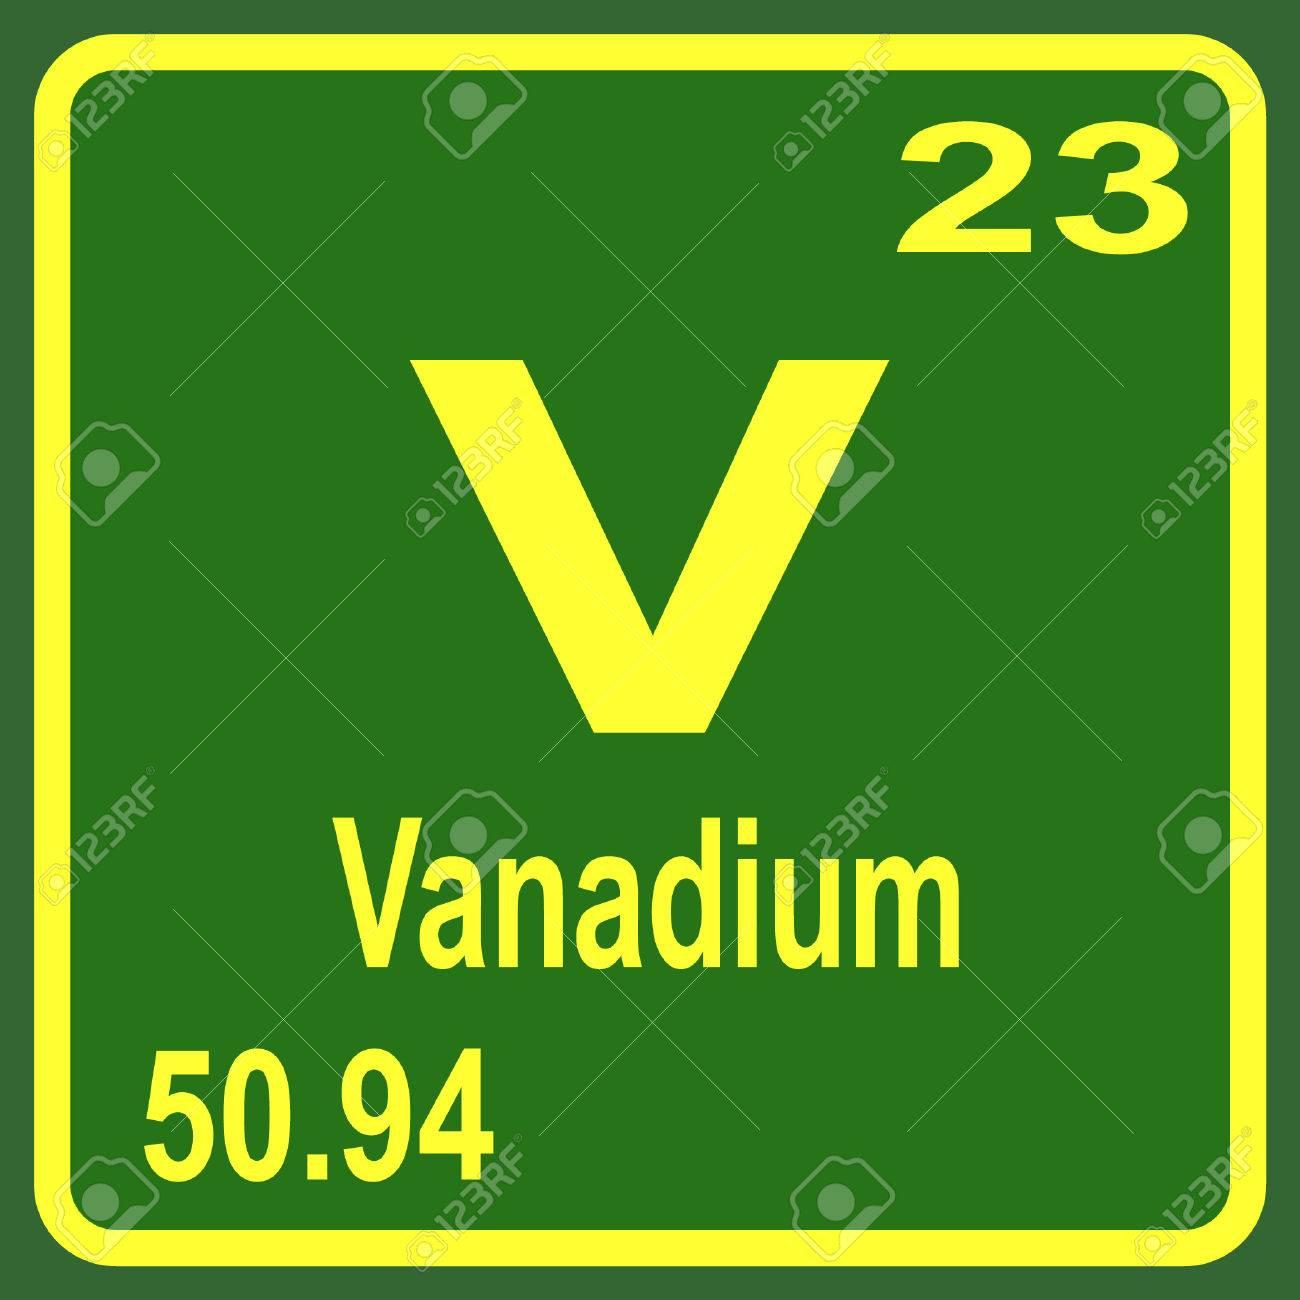 Periodic table of elements vanadium royalty free cliparts vectors periodic table of elements vanadium stock vector 53900413 urtaz Choice Image